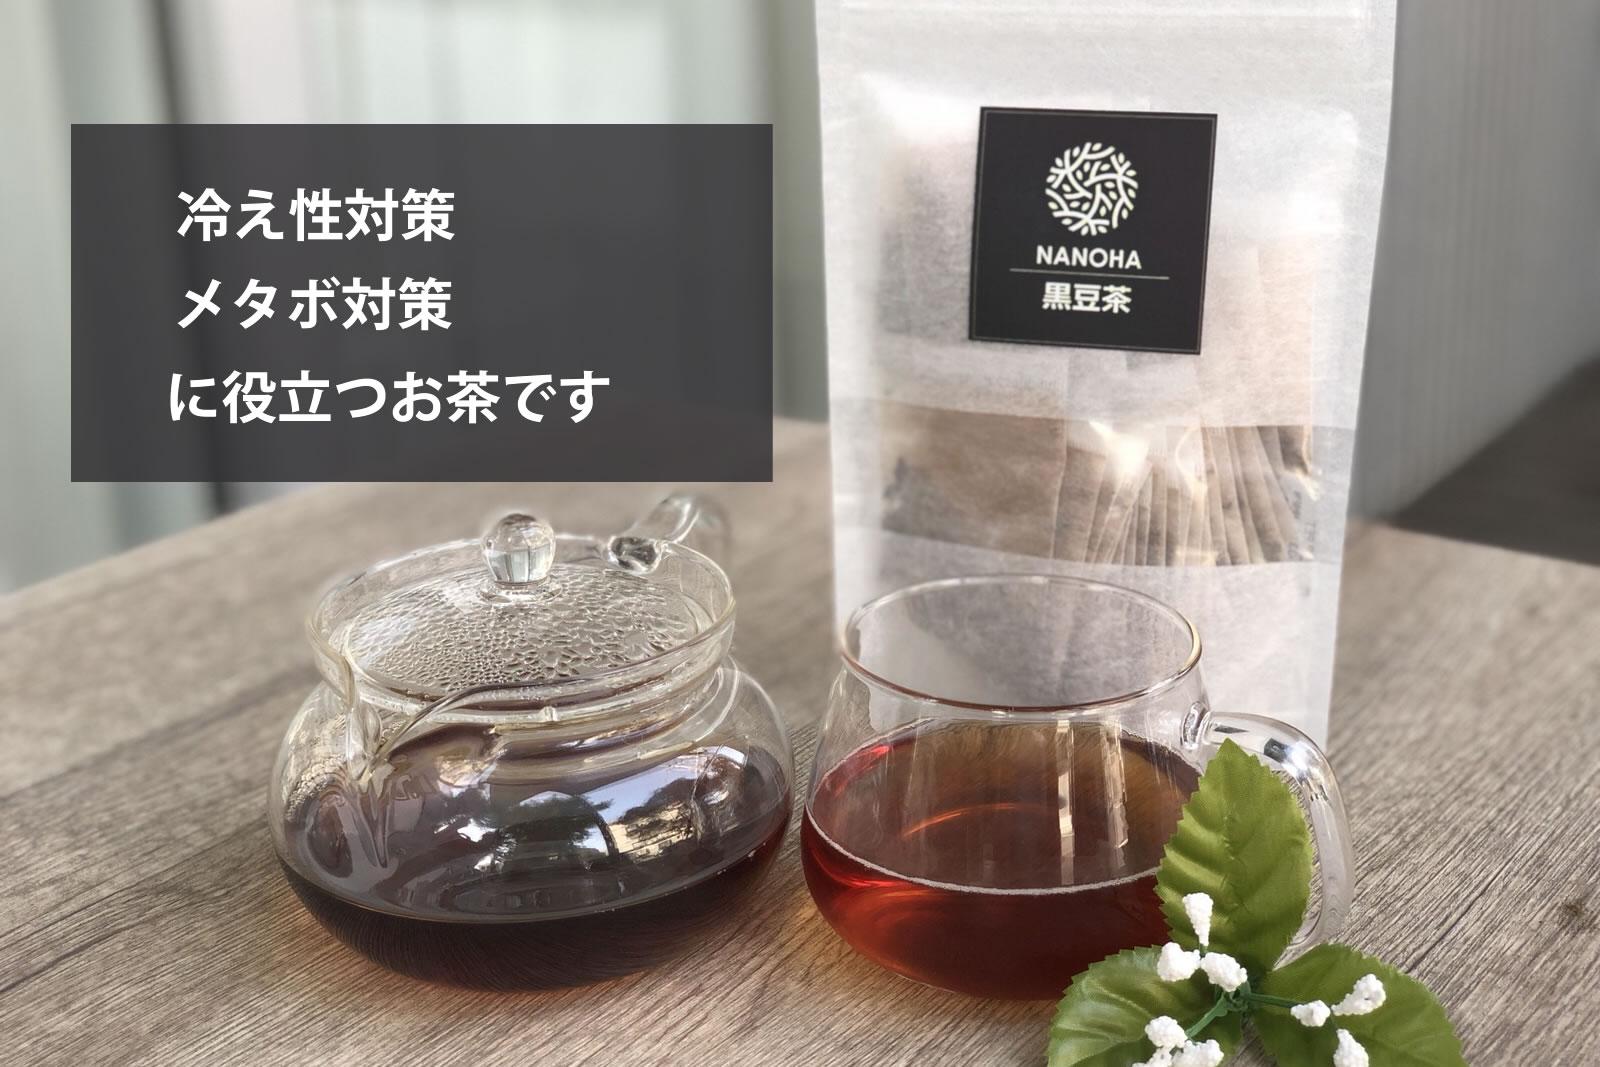 黒豆茶の詳細情報